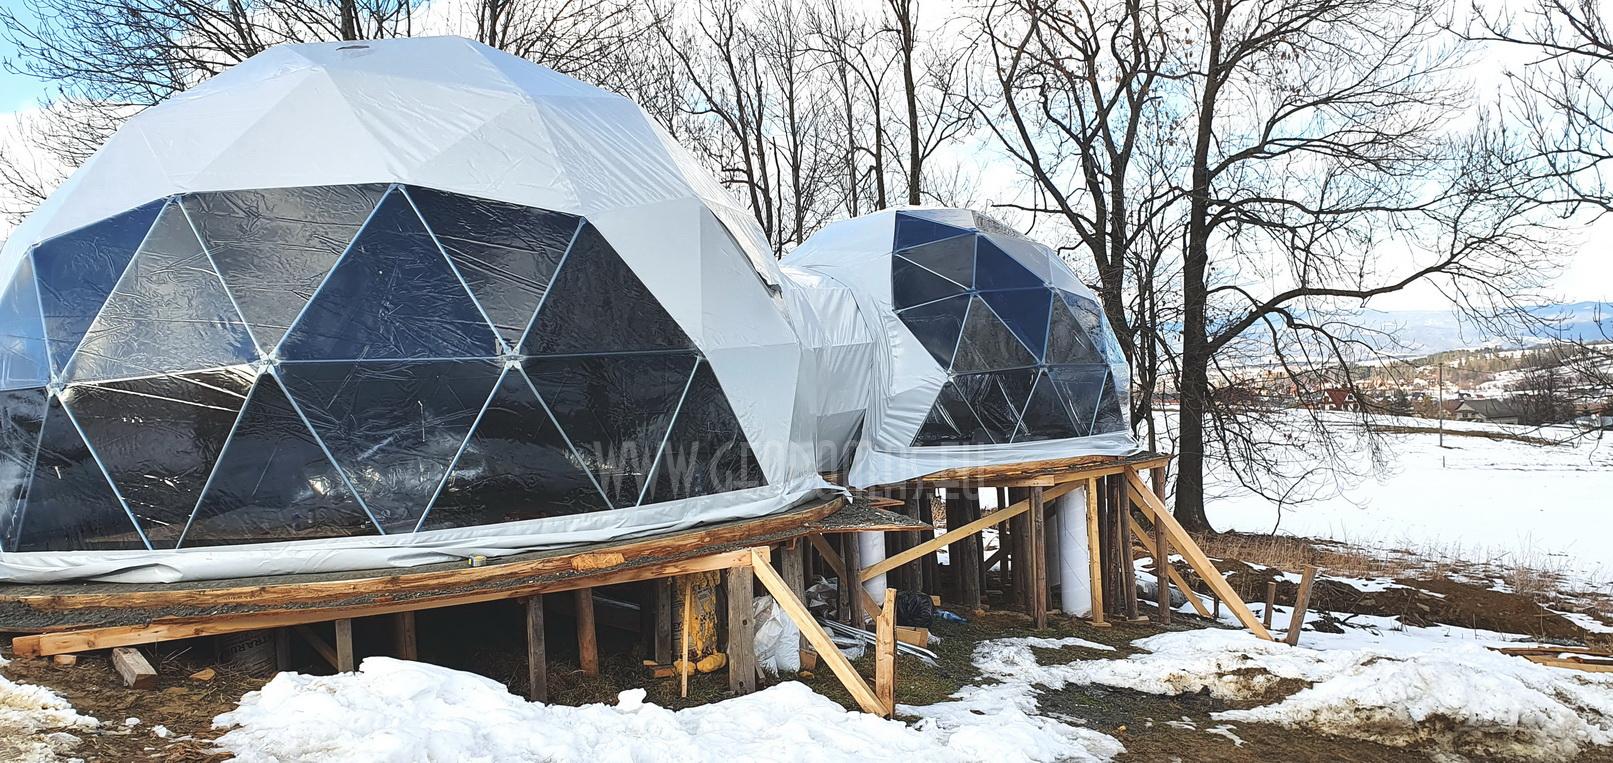 35m²+ 20m² Glamping SPA Domes Ø6,7m & Ø5m   Zakopane Resort, Poland